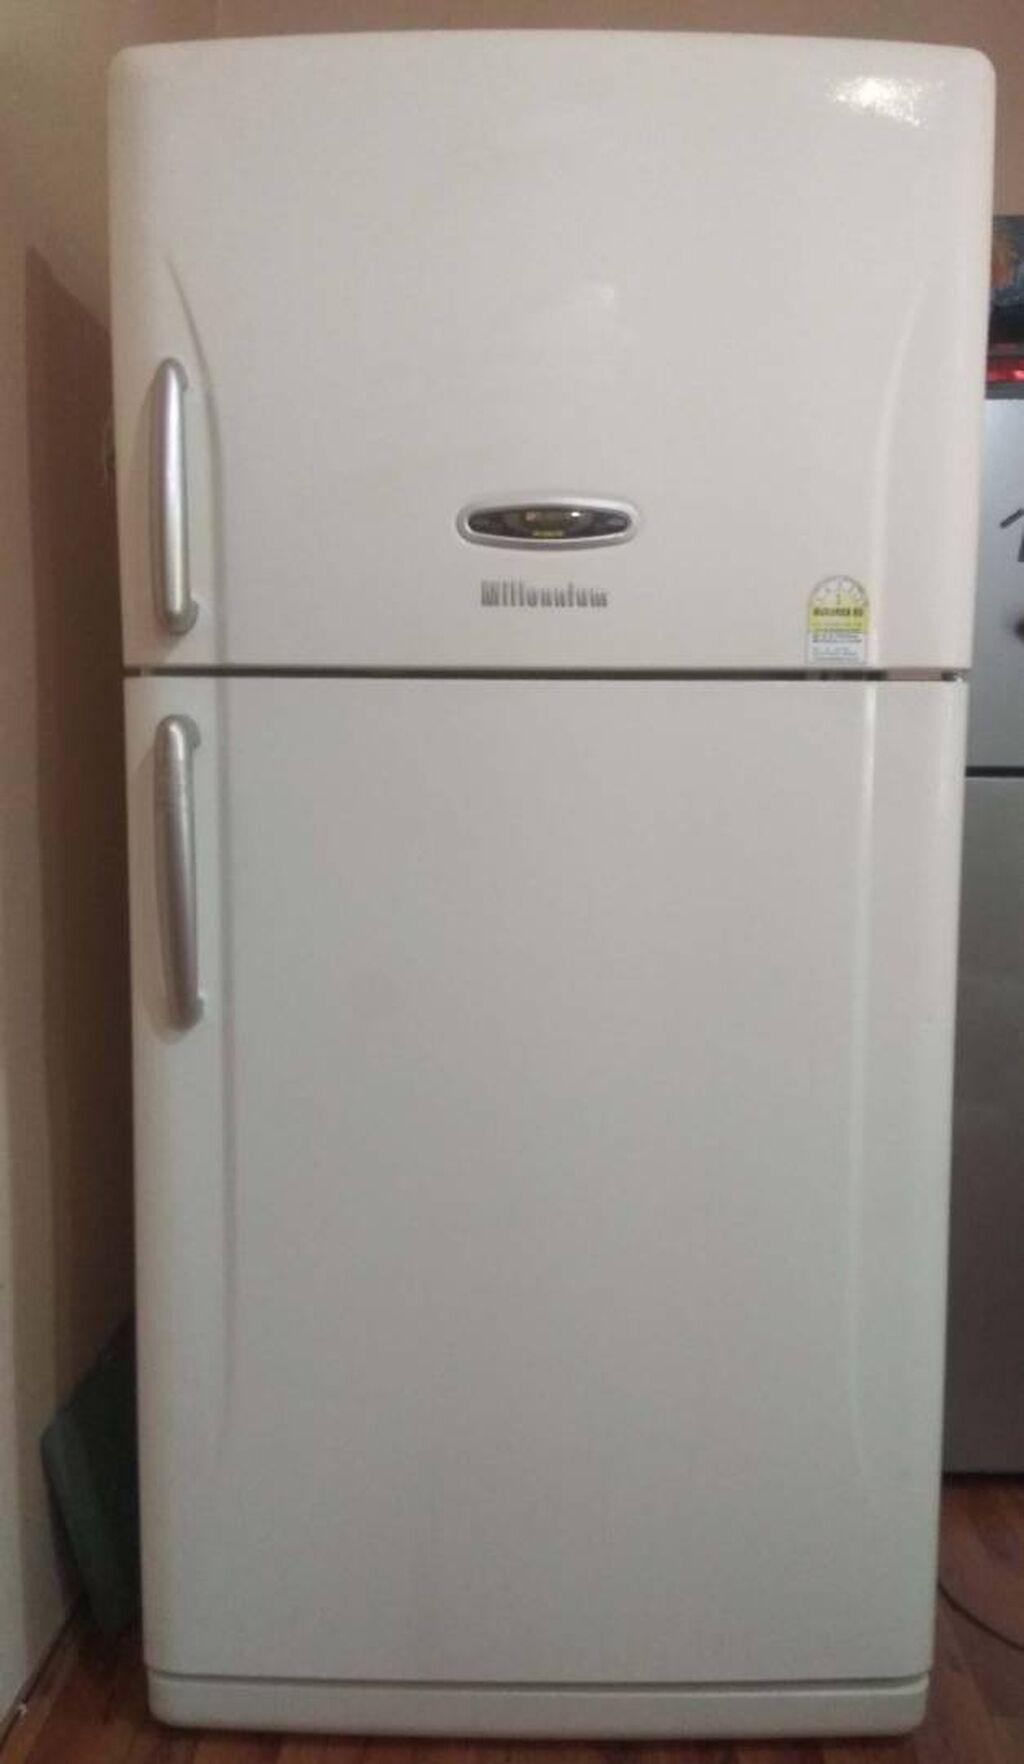 | Б/у Двухкамерный | Белый холодильник: | Б/у Двухкамерный | Белый холодильник